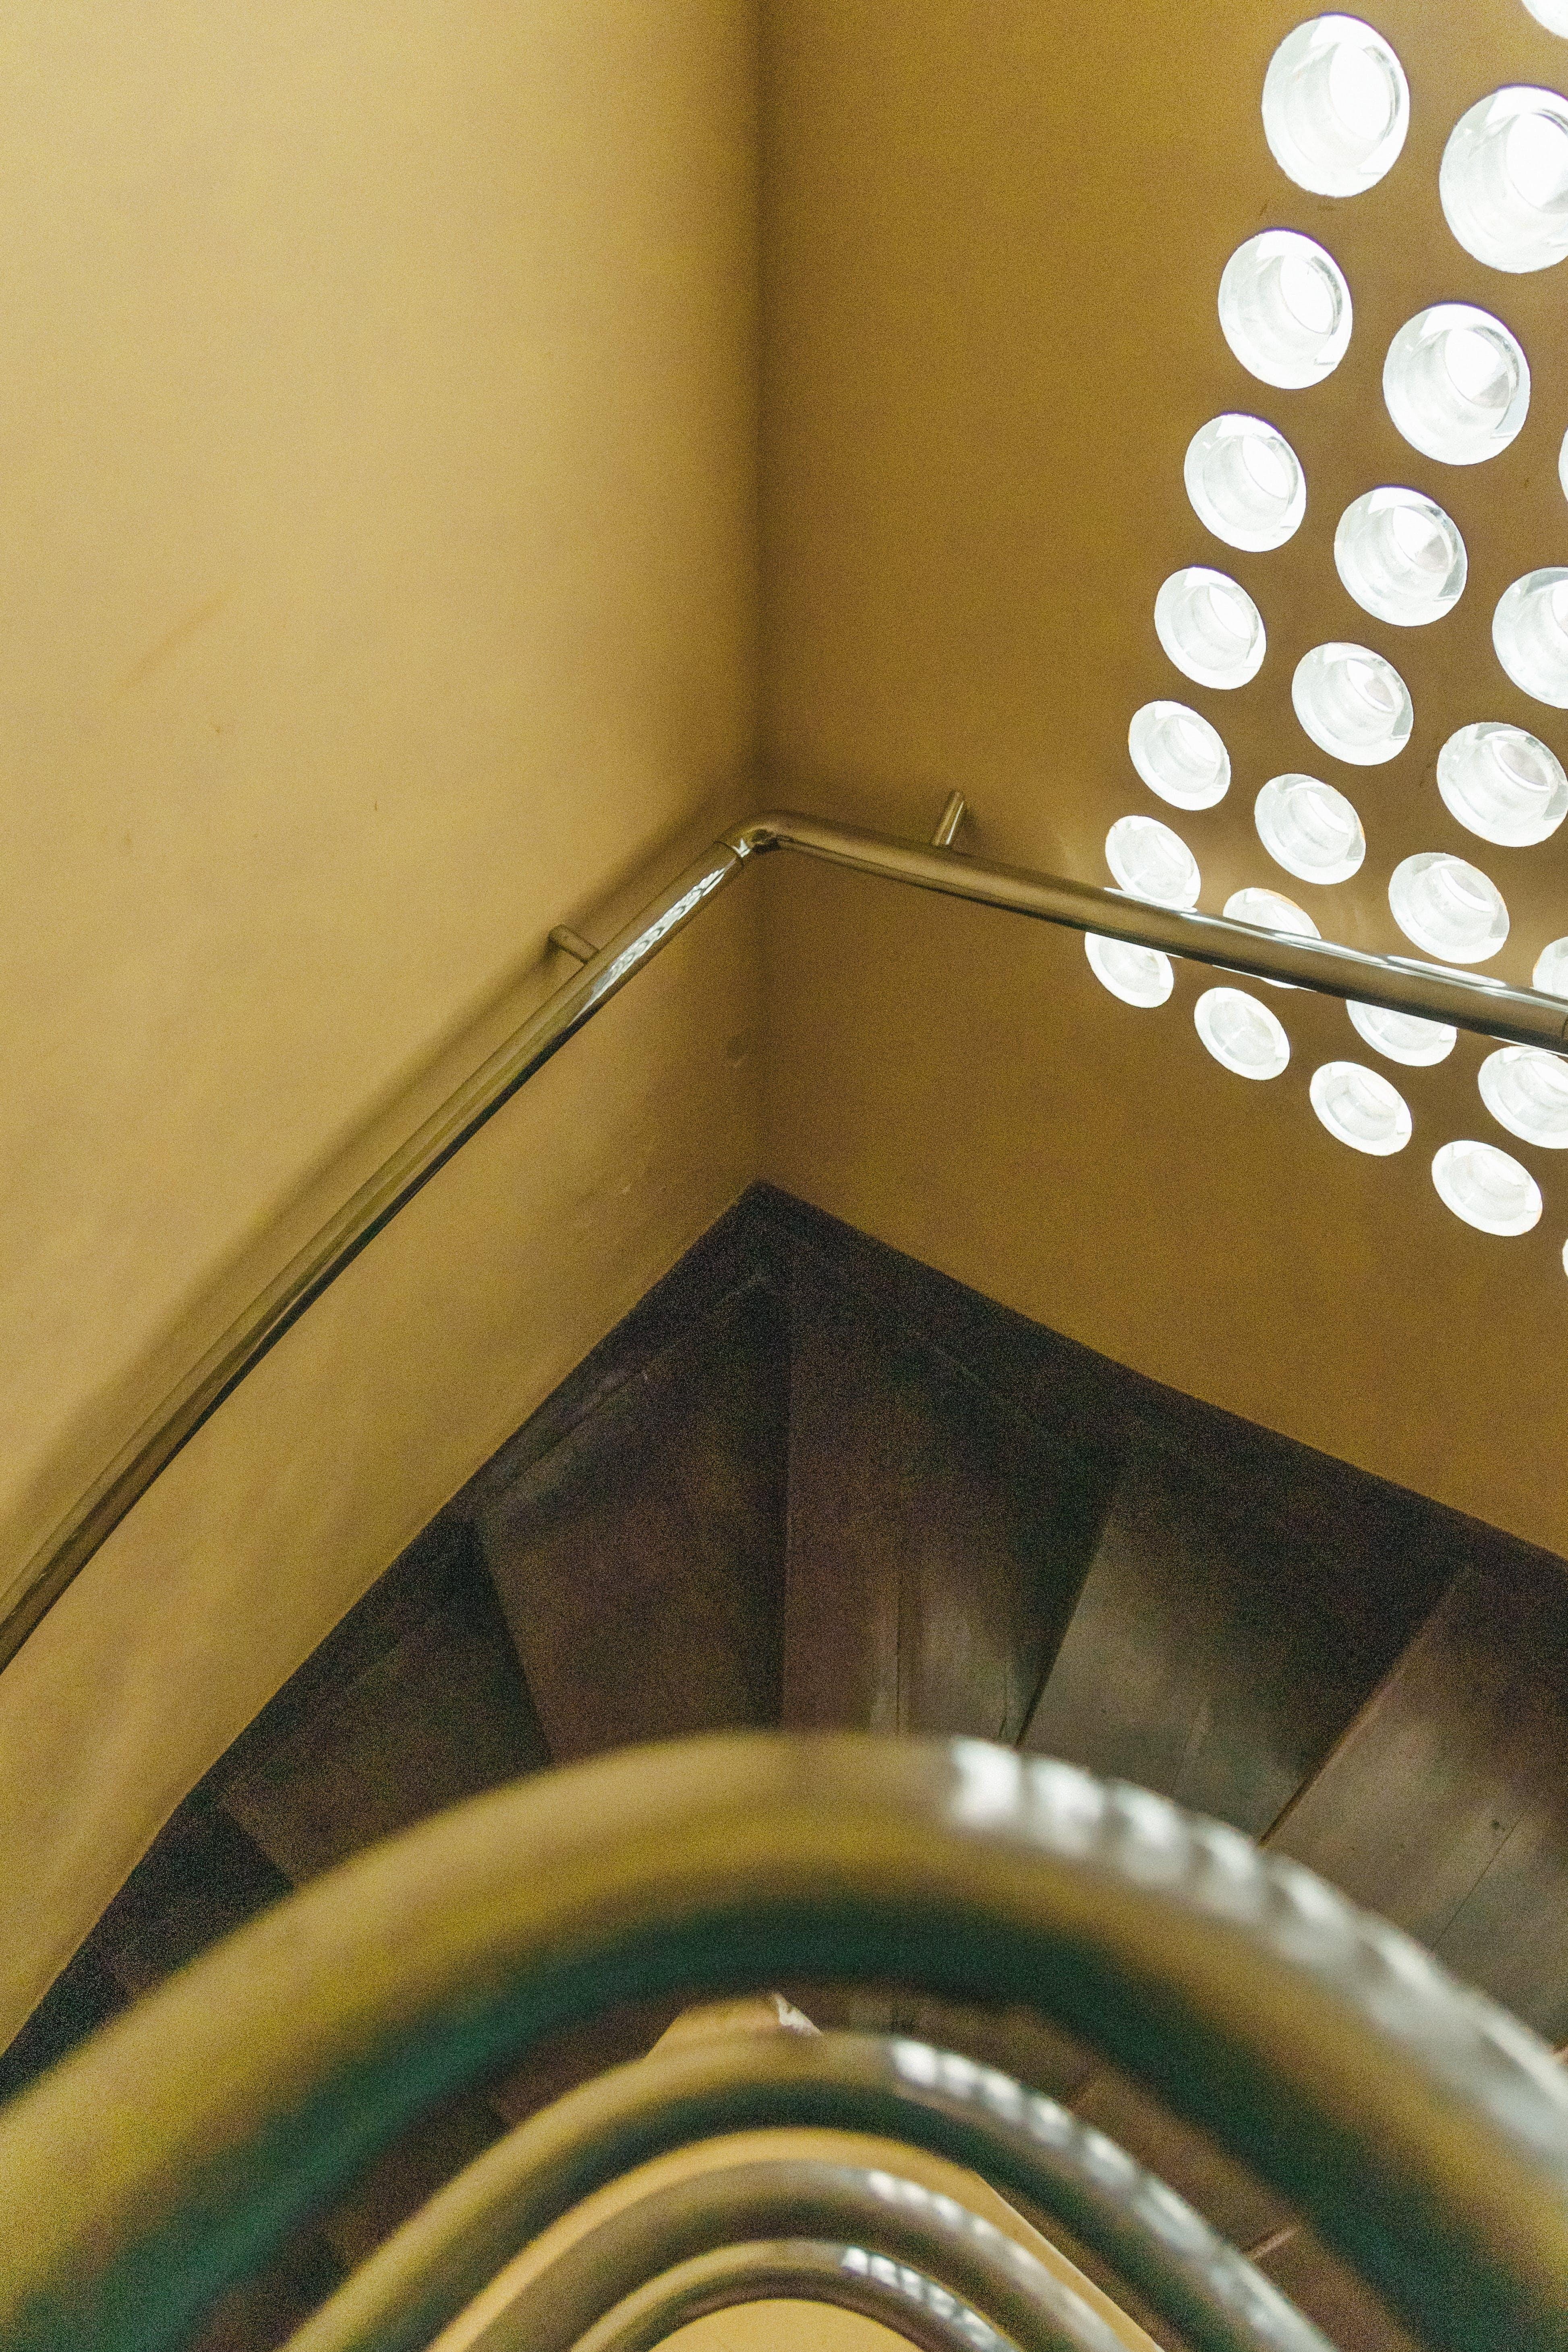 Fotos de stock gratuitas de acero, adentro, arquitectónico, arquitectura